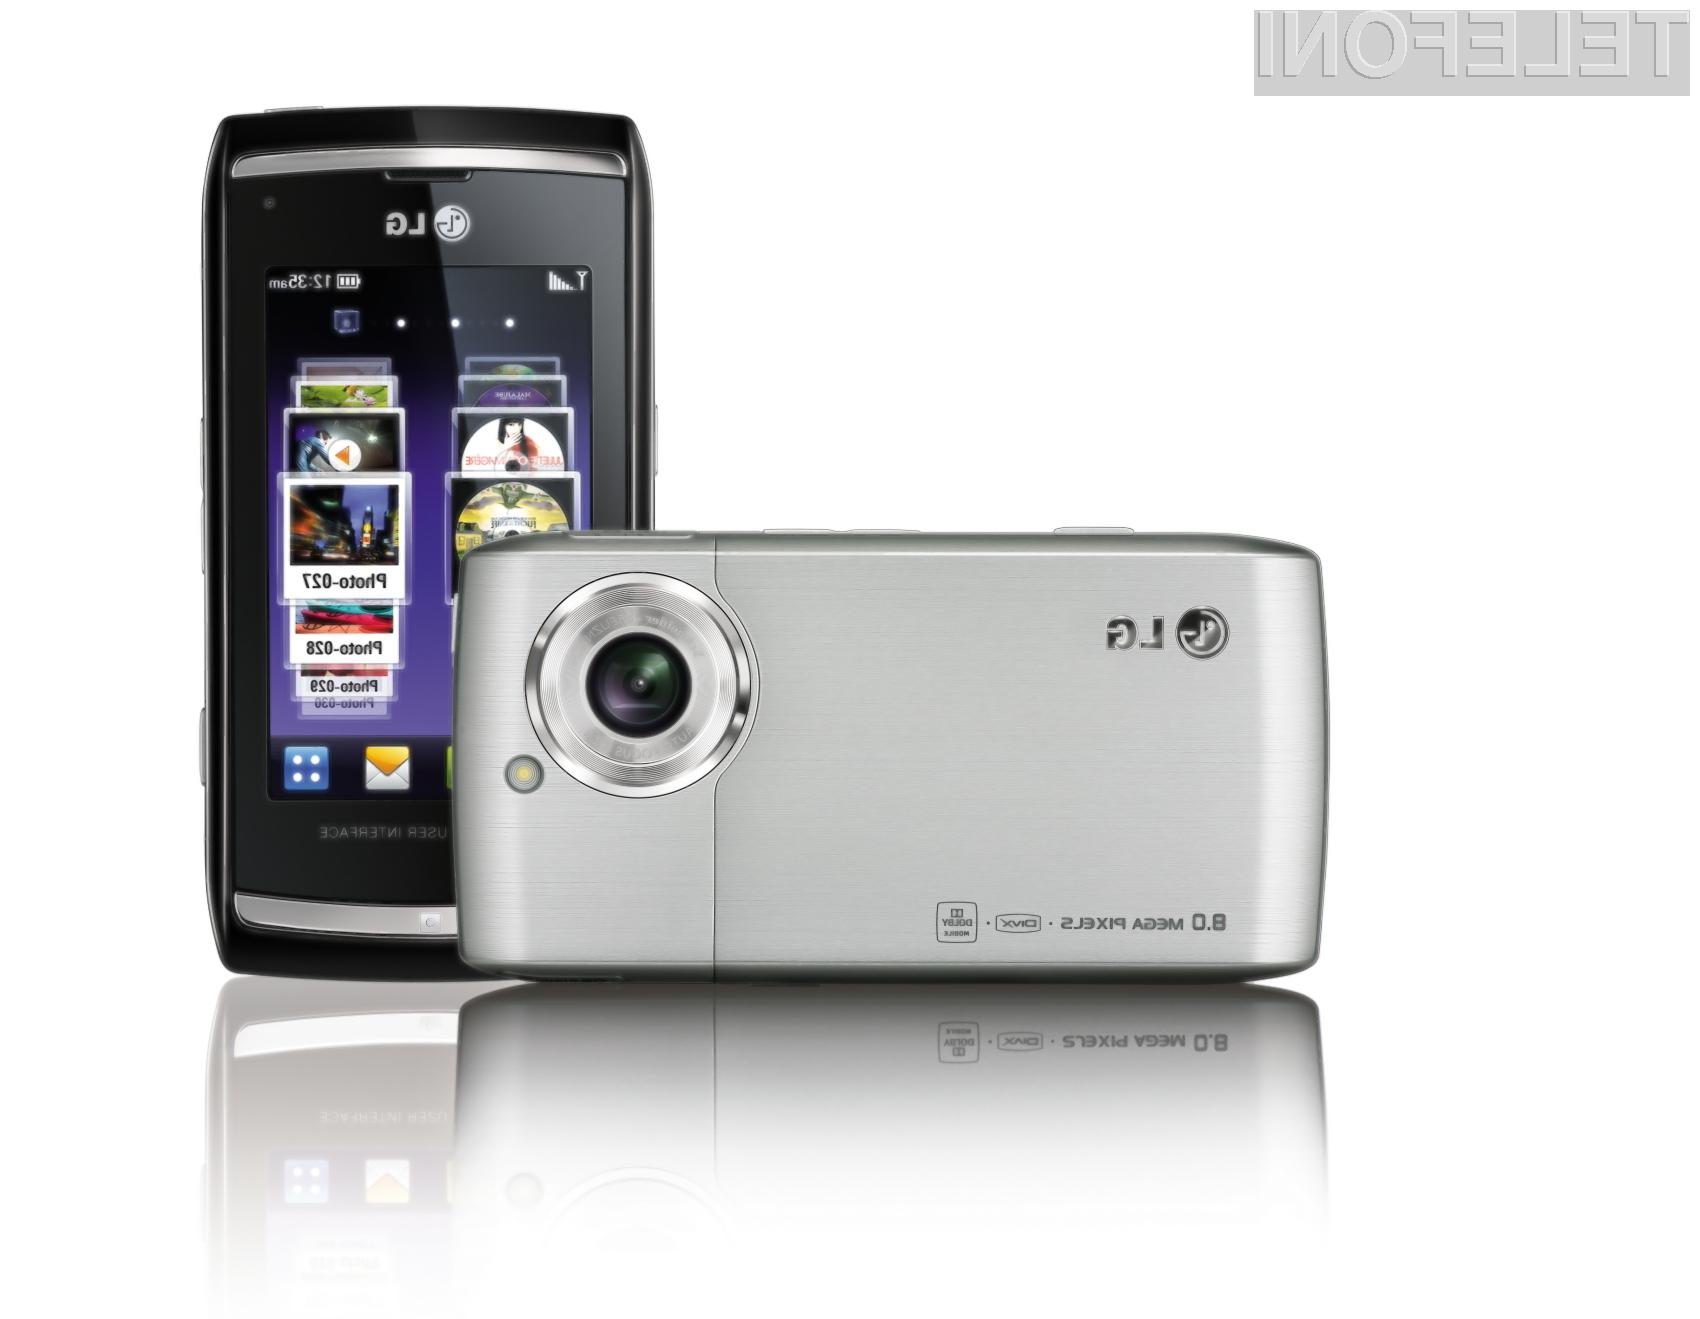 LG Viewty Smart - LG-GC900.